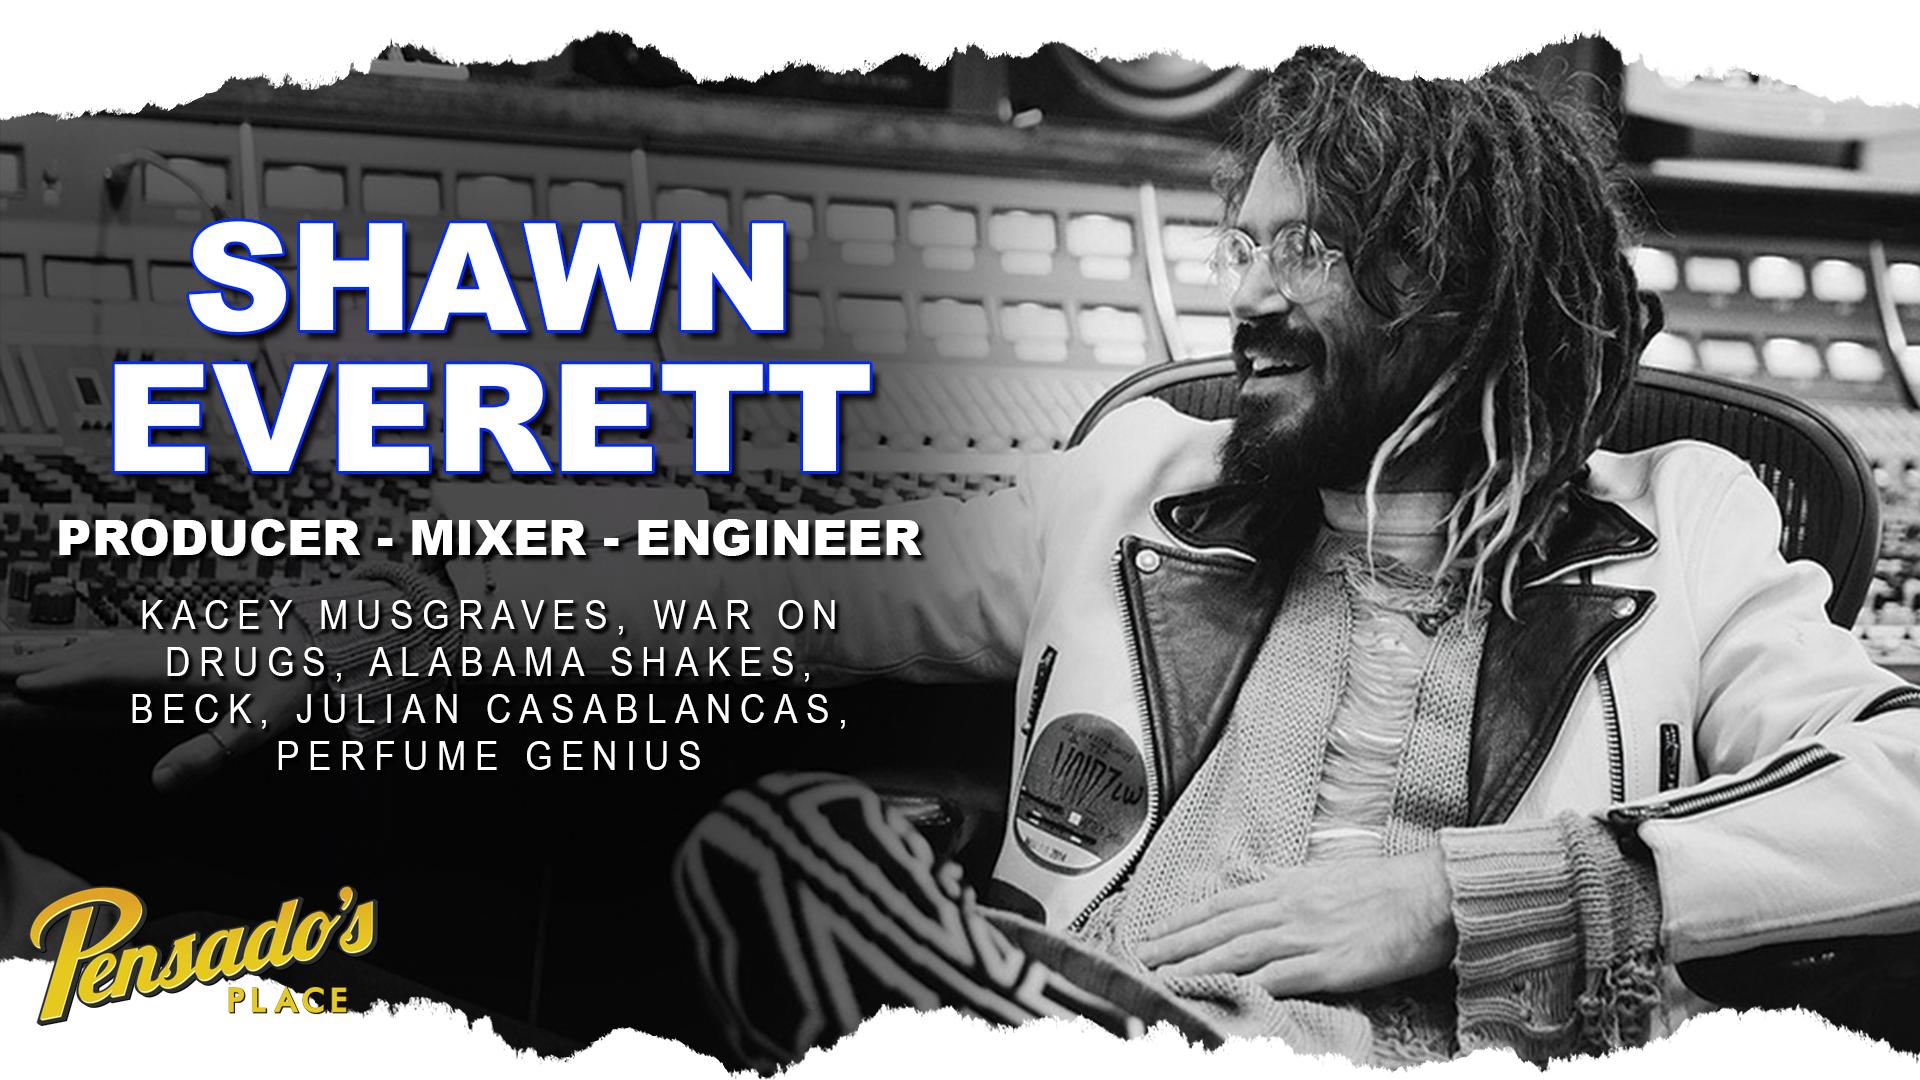 Alabama Shakes Producer / Mixer / Engineer, Shawn Everett